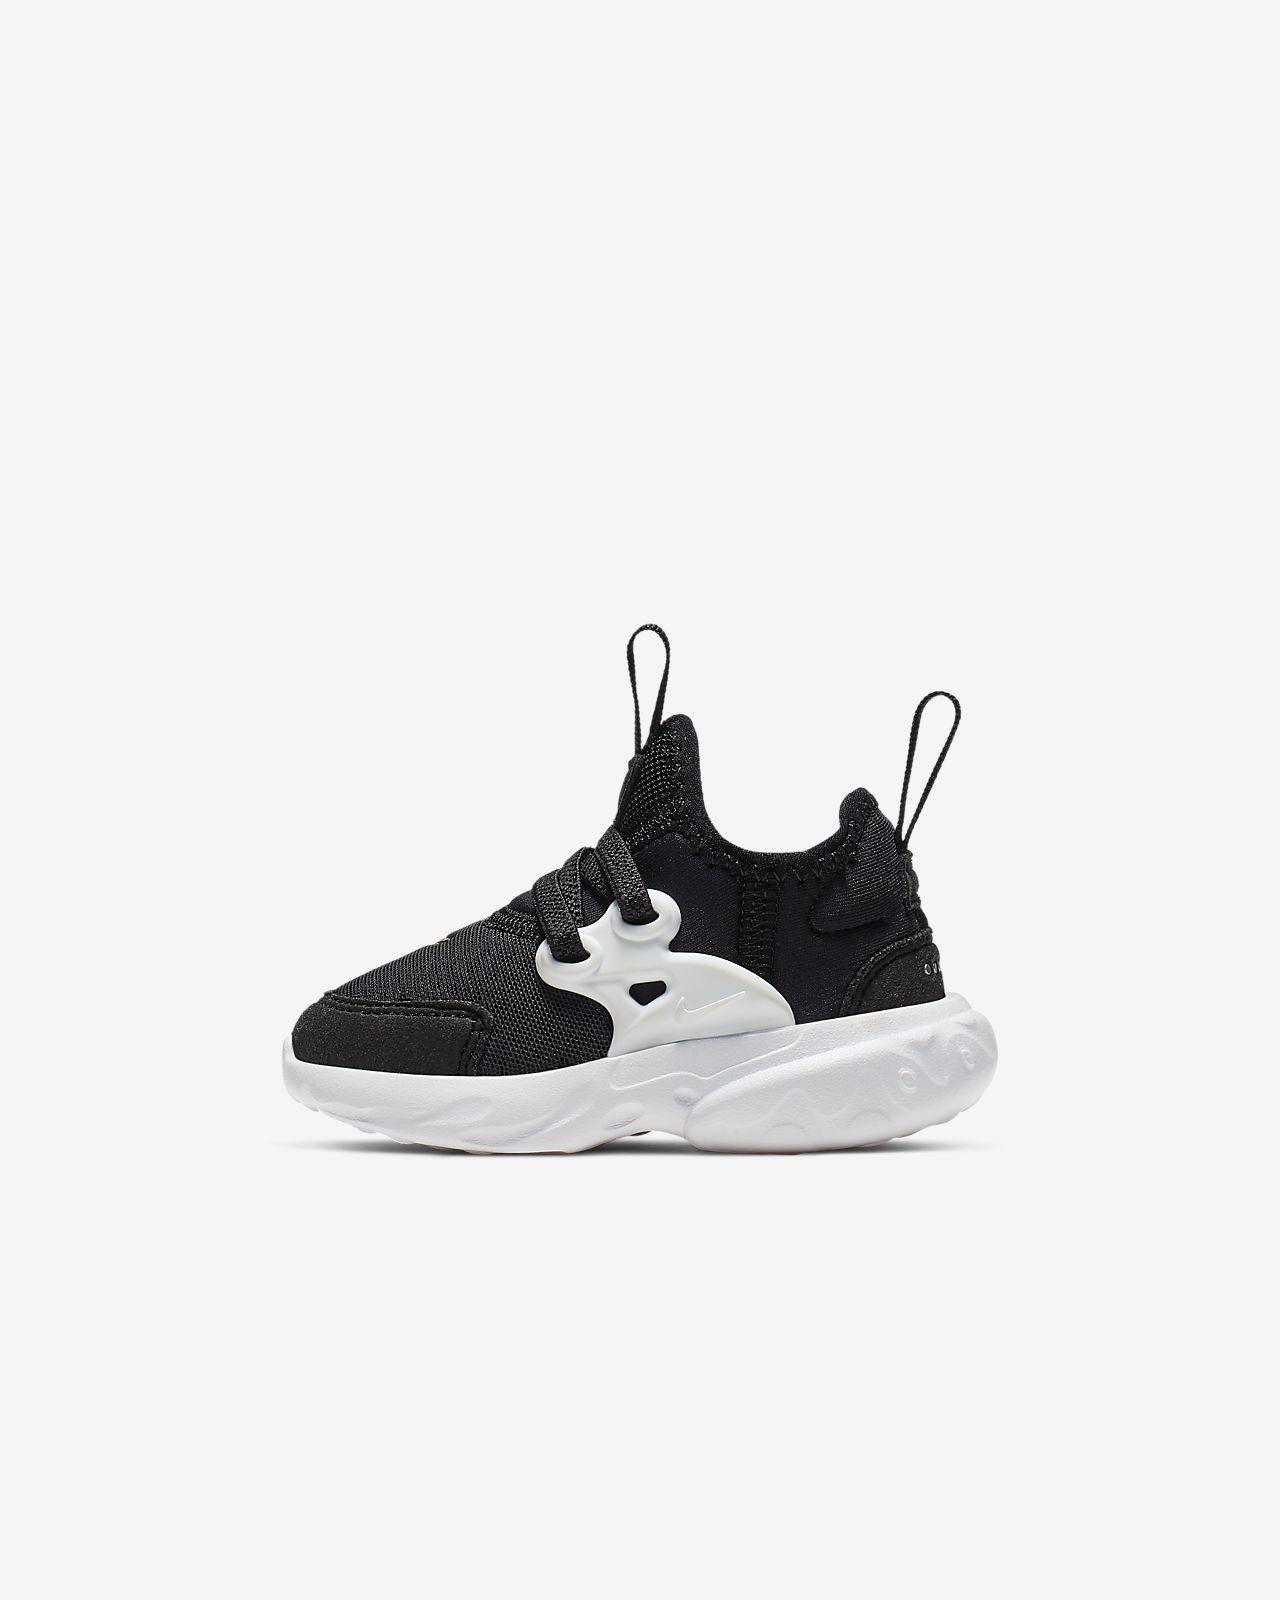 Pasteles Consciente de región  Nike RT Presto Schuh für Babys und Kleinkinder. Nike AT